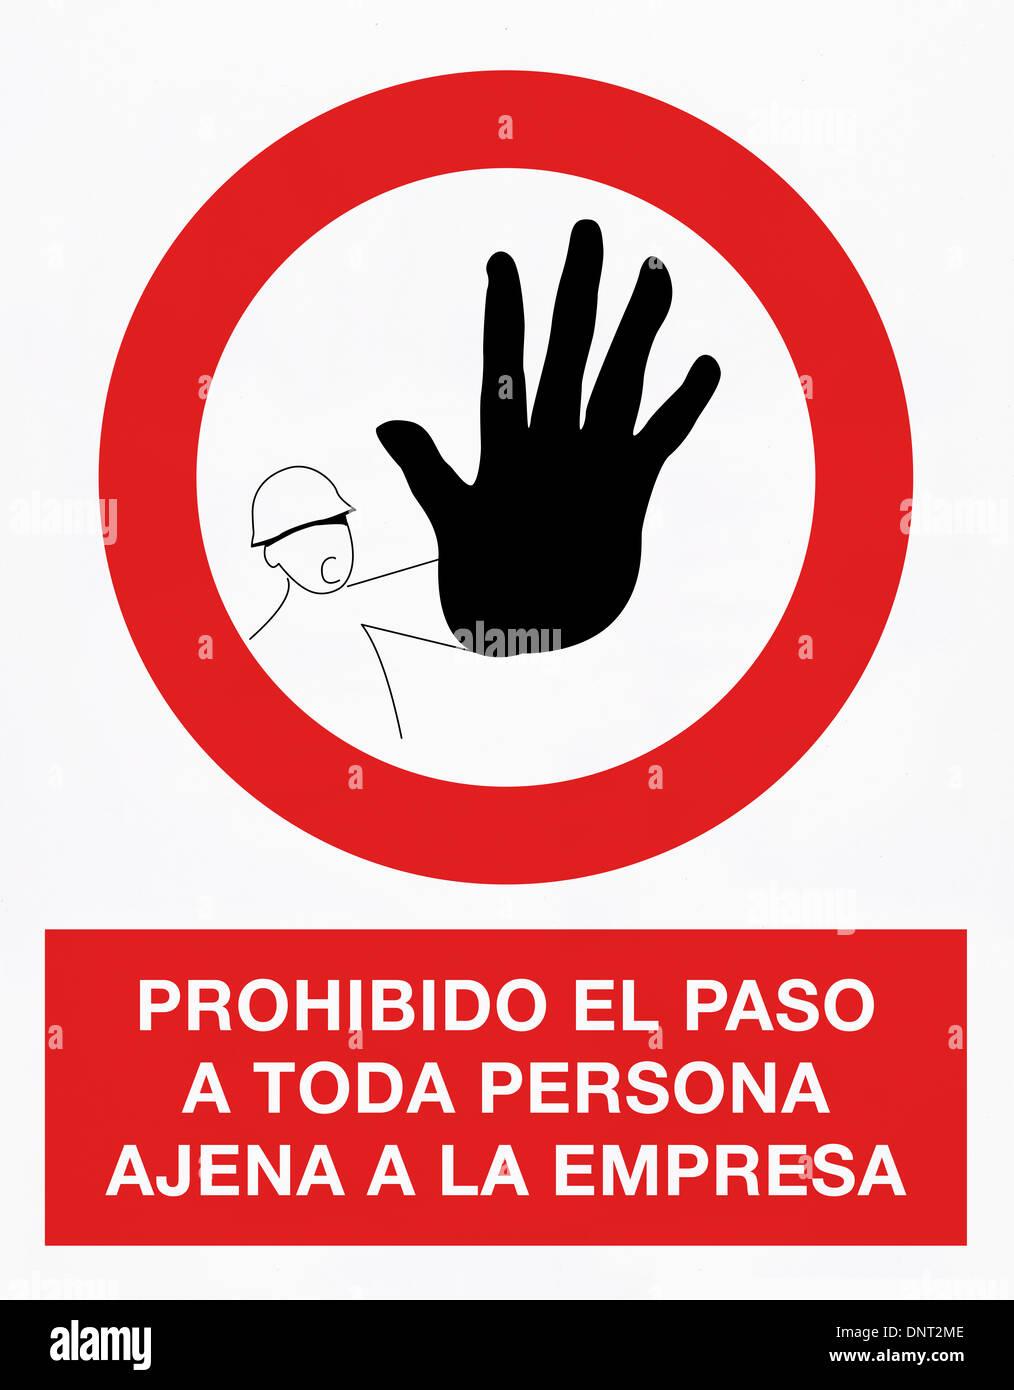 No thoroughfare signal in spanish language - Stock Image